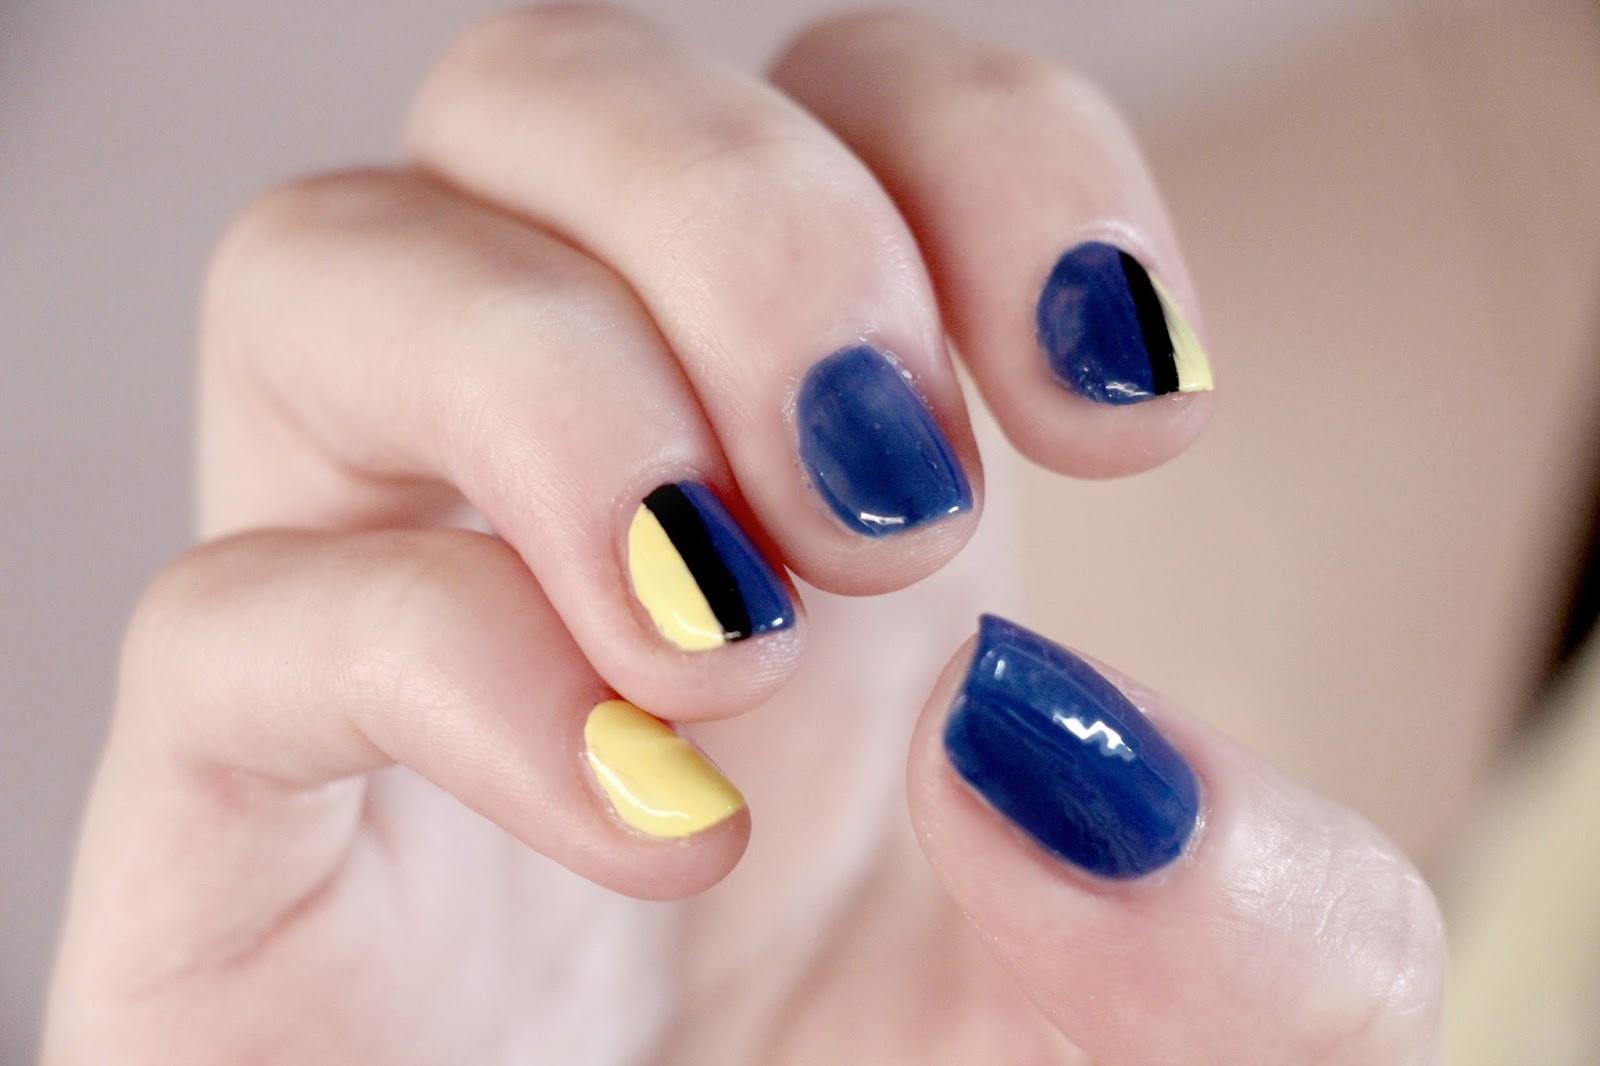 Finding Dory nail art